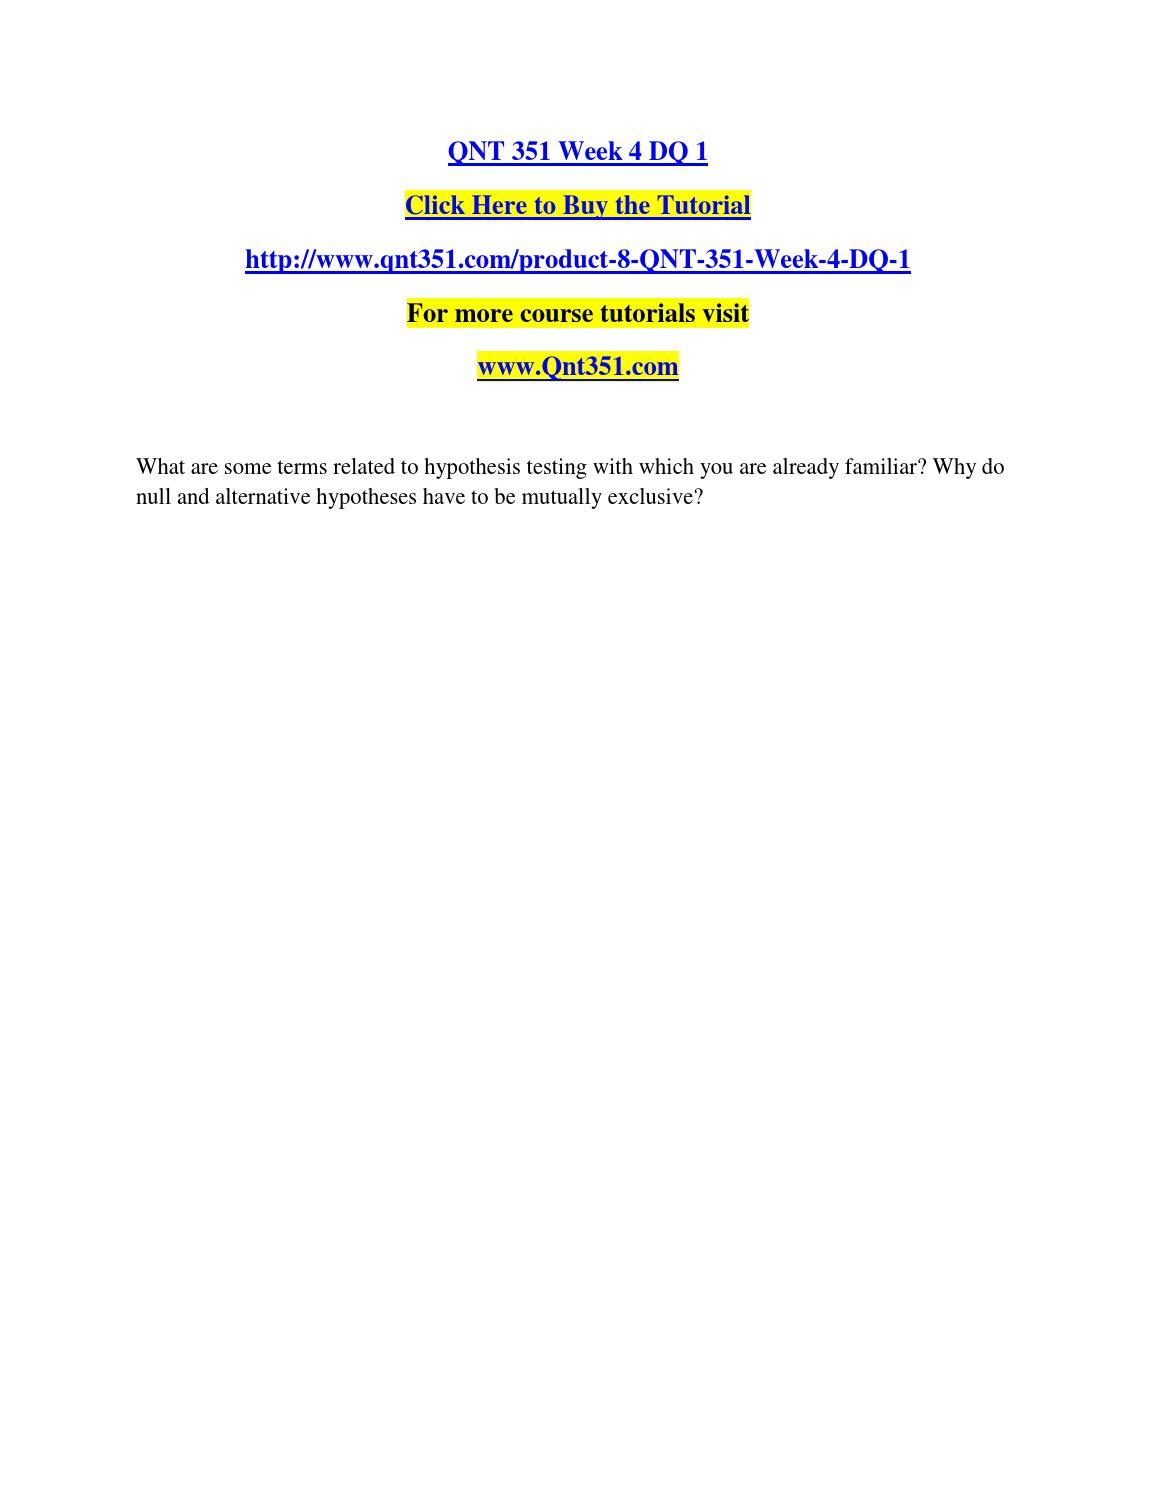 Qnt 351 one population hypothesis test